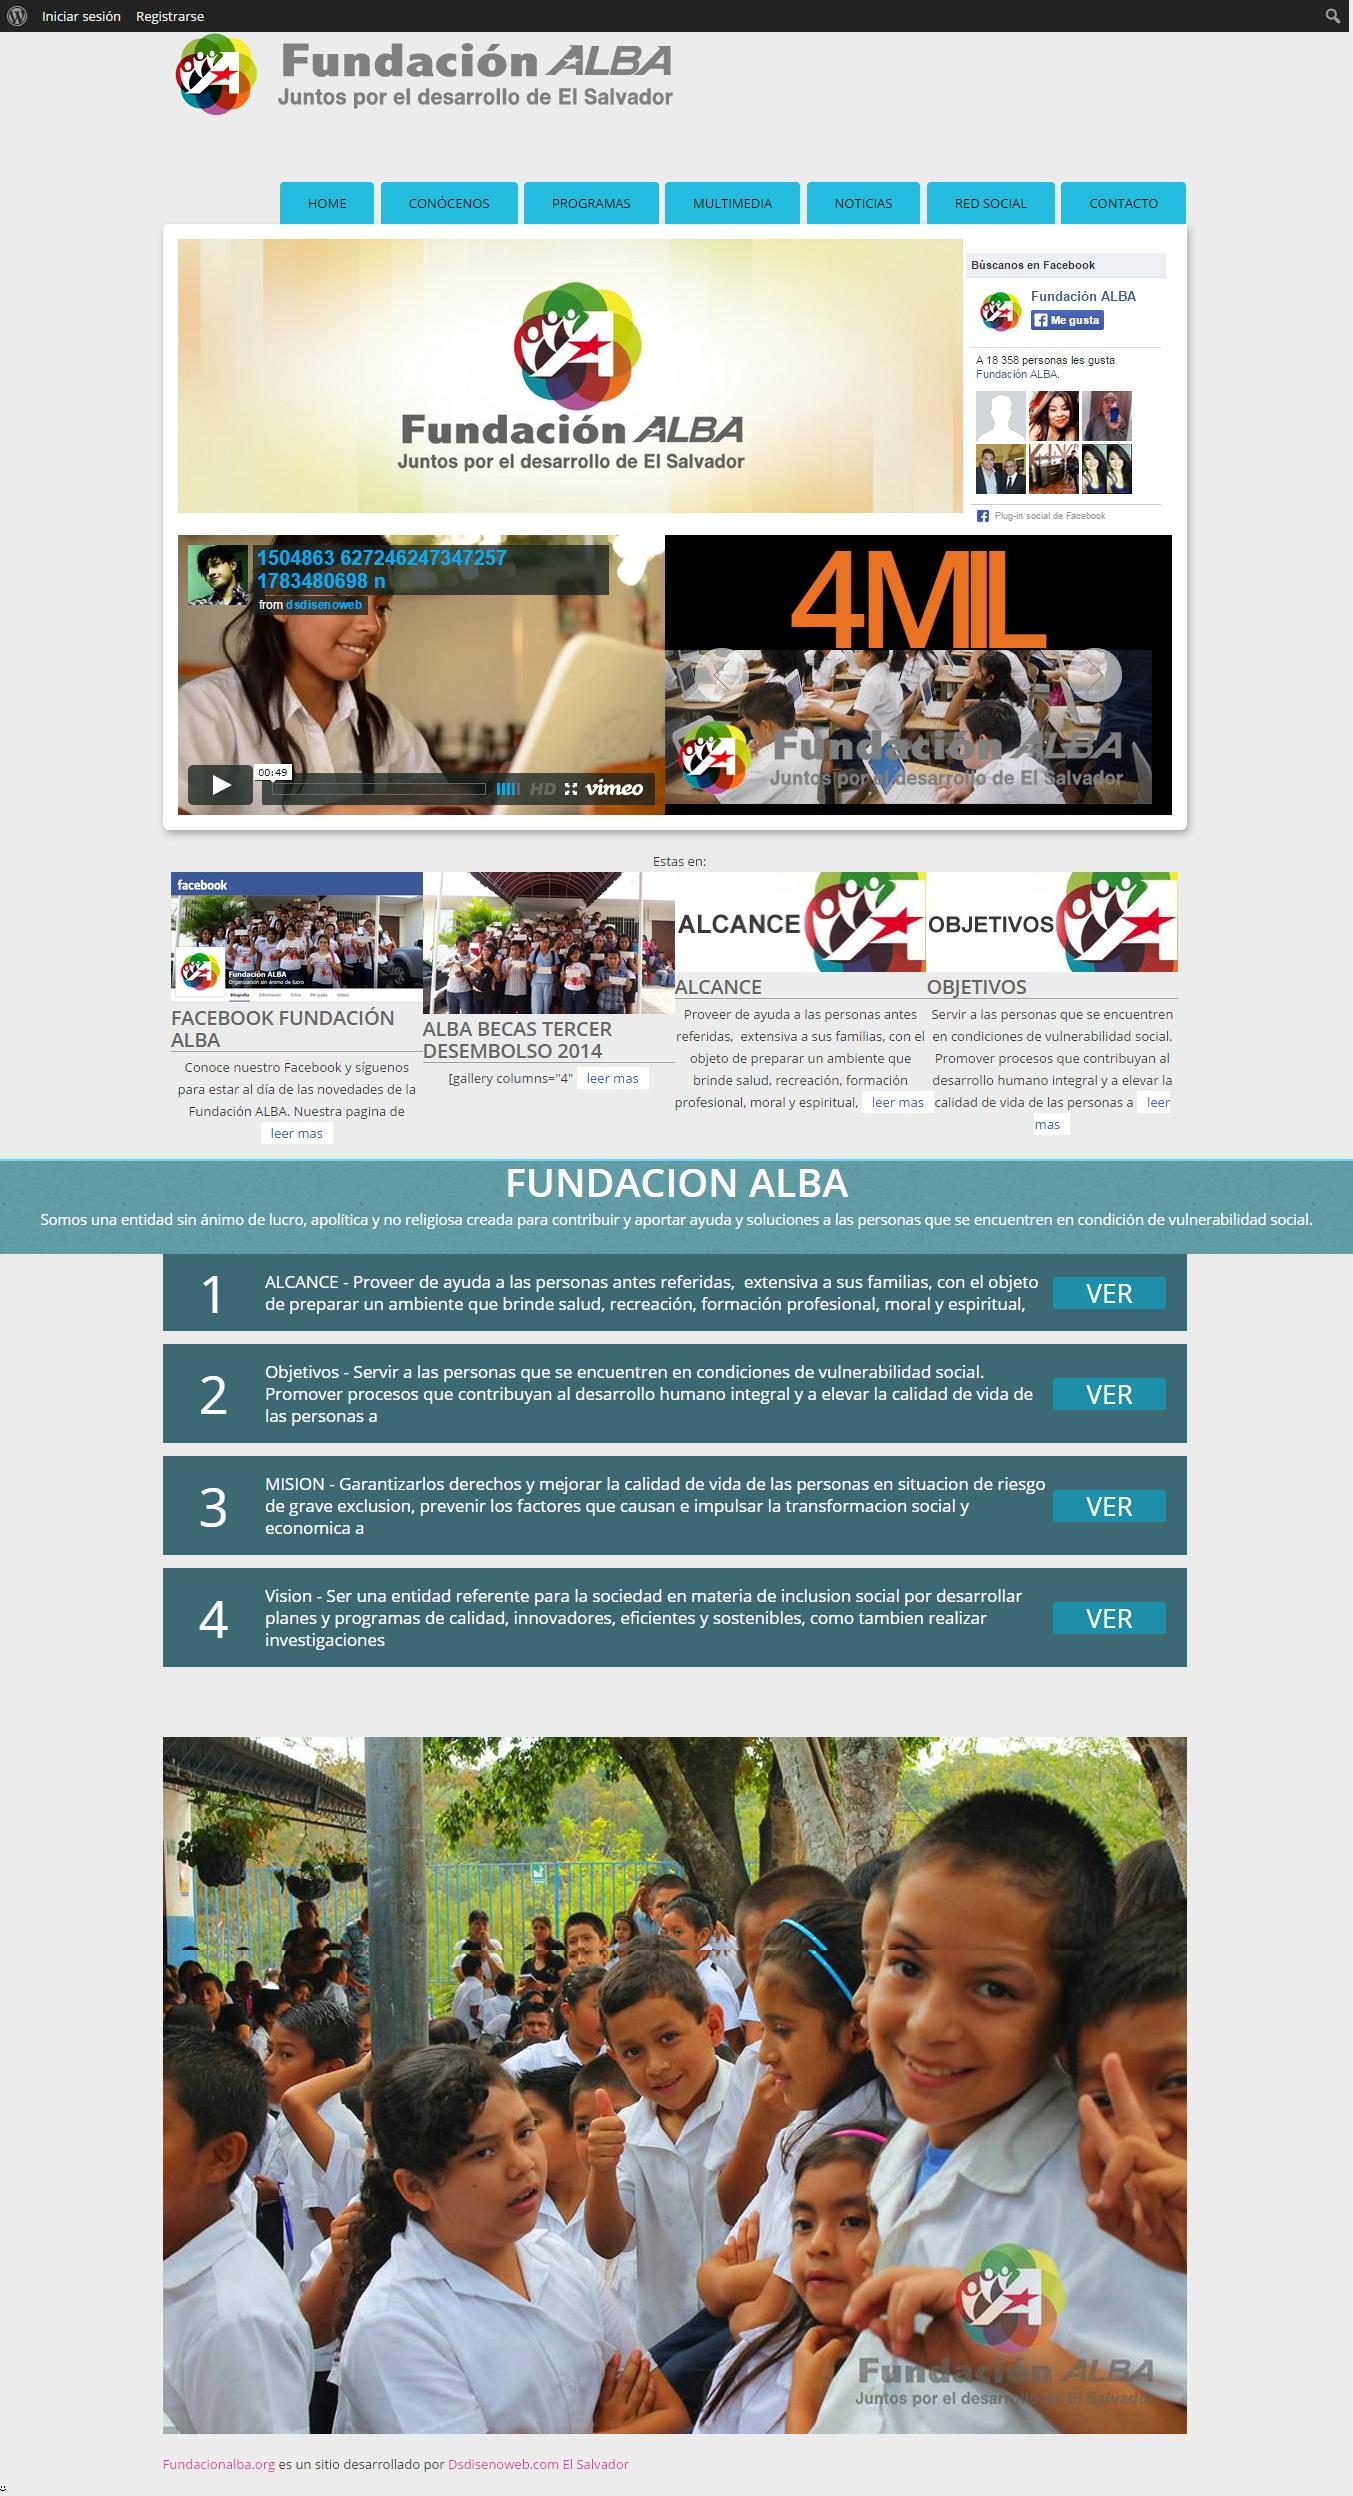 fundacionalba.org